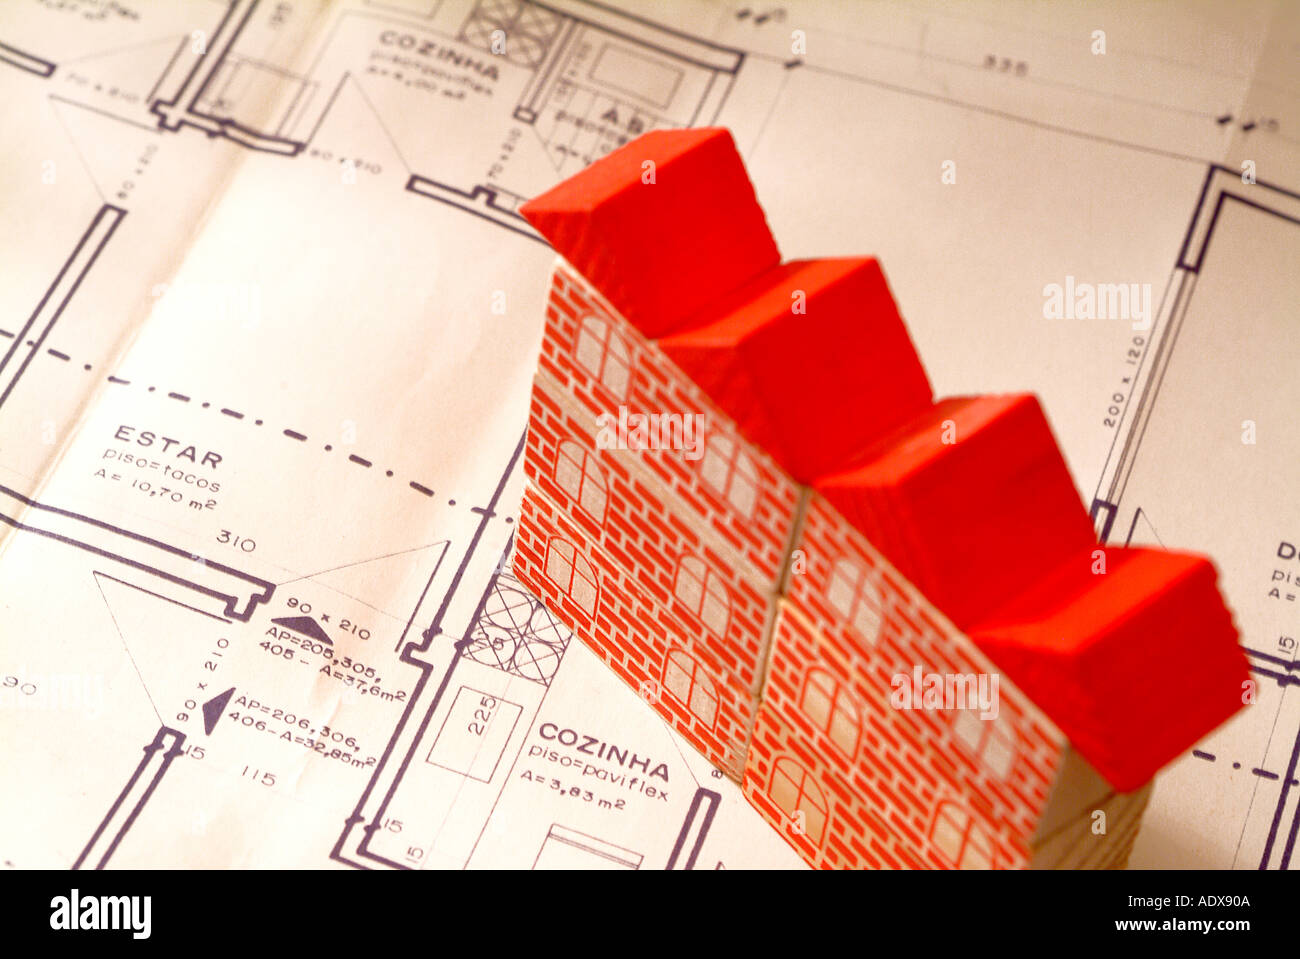 Architecture blueprint blocks toy model building red roof plan architecture blueprint blocks toy model building red roof plan scheme diagram project concept conceptual background architecture malvernweather Choice Image